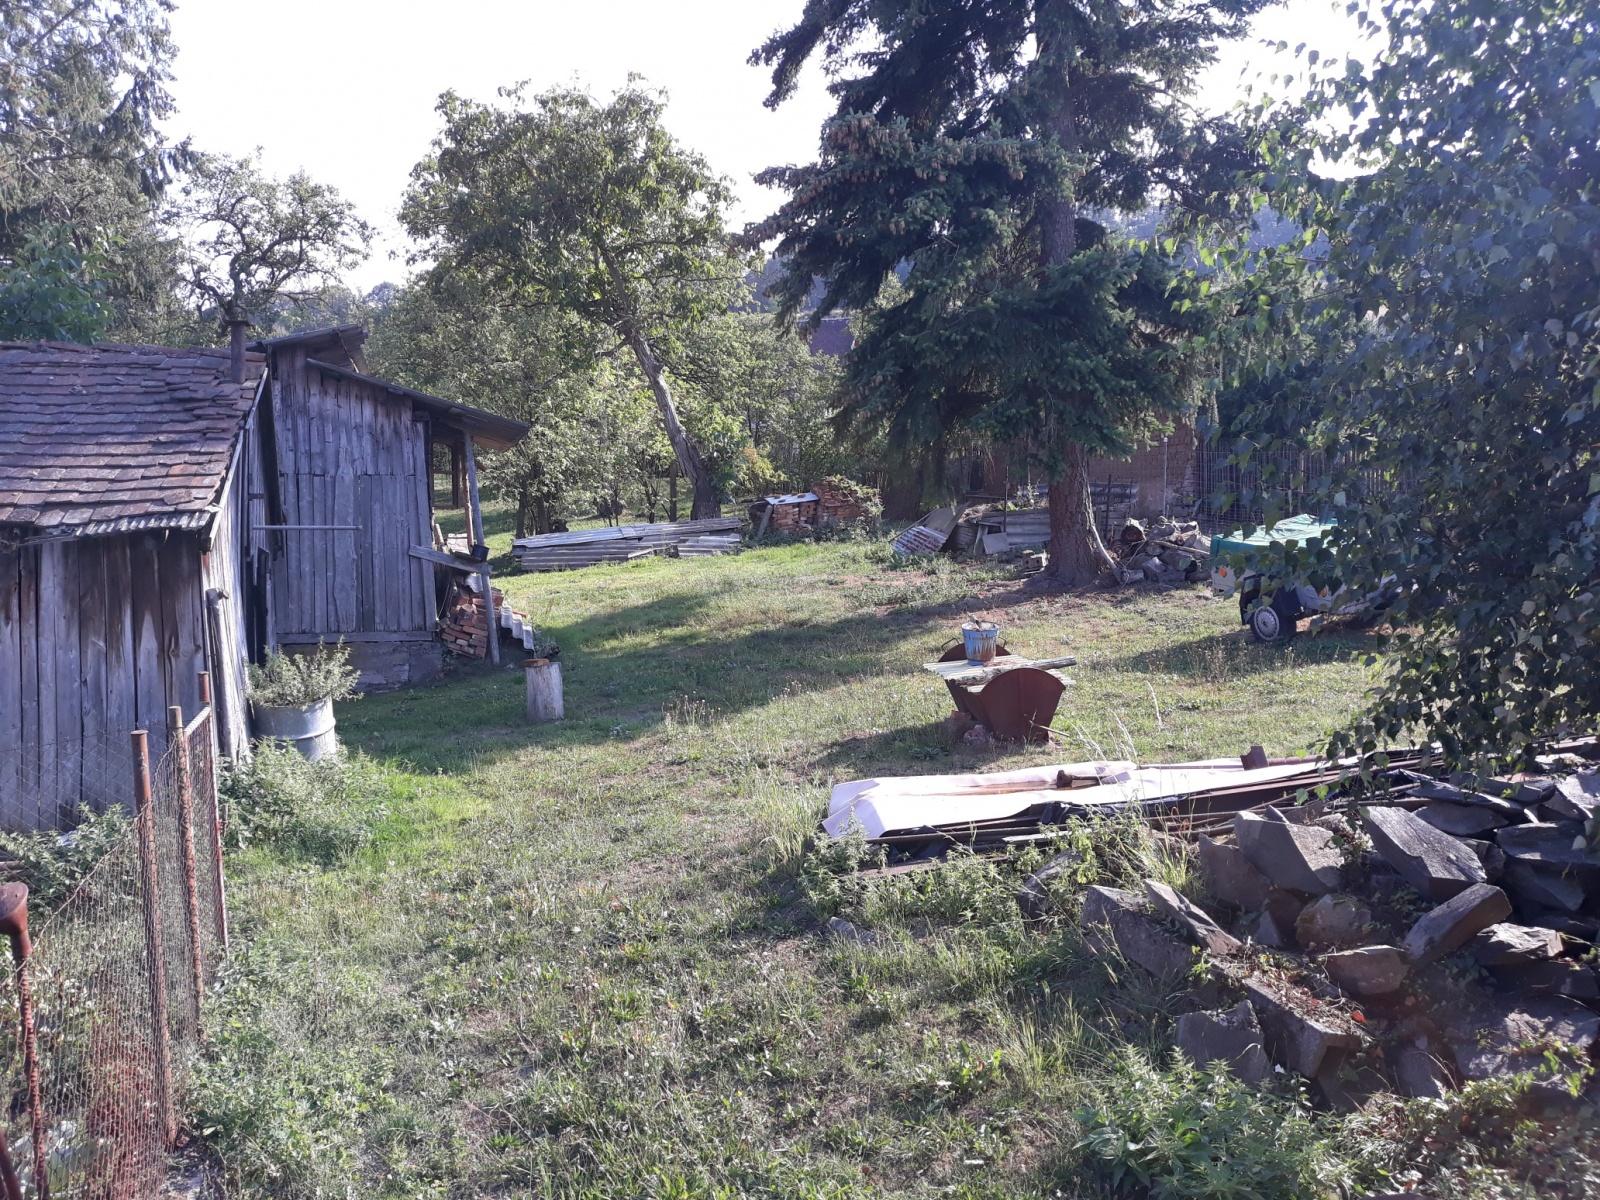 Prodej, rodinný dům, Ostrovec - Lhotka, okres Rokycany